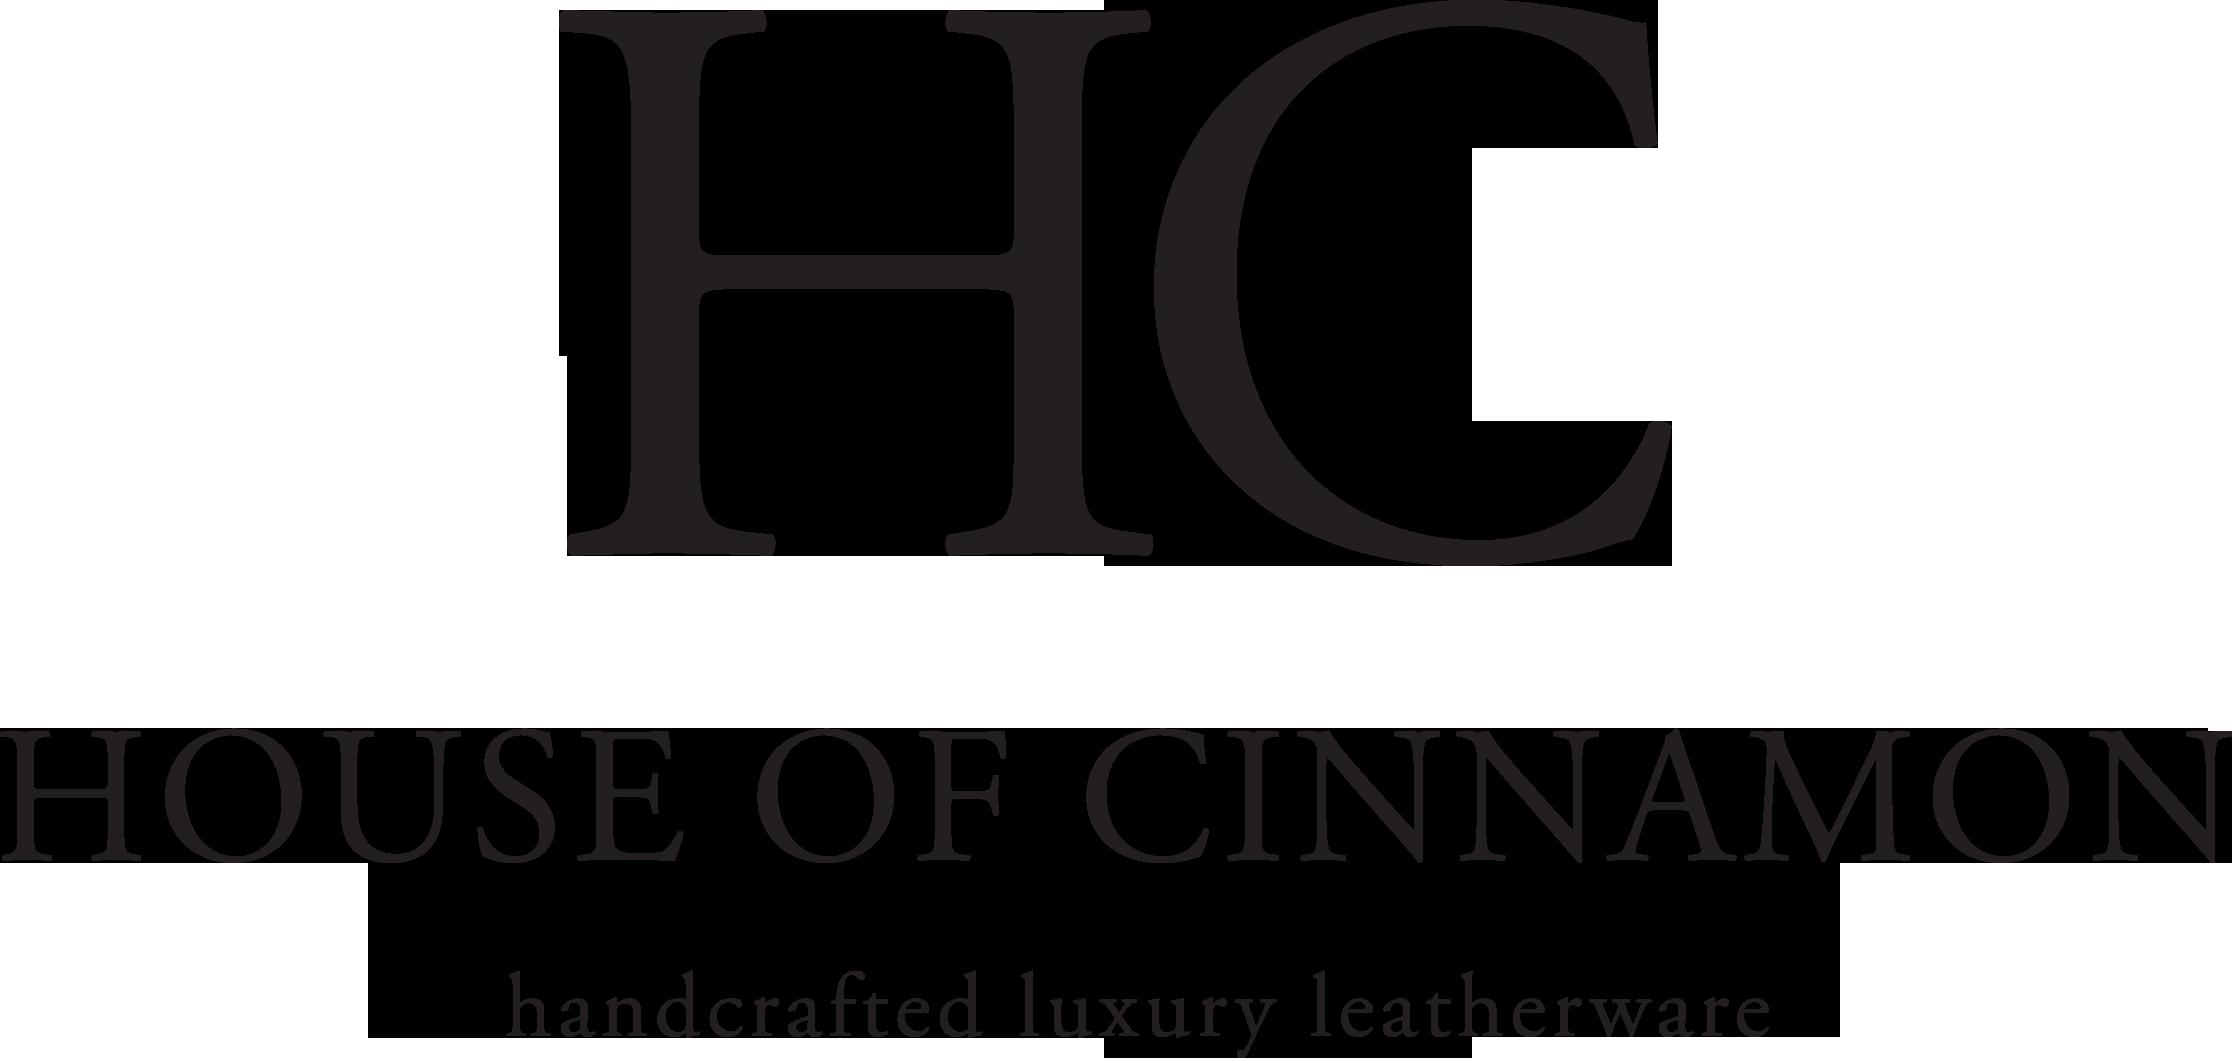 House Of Cinnamon